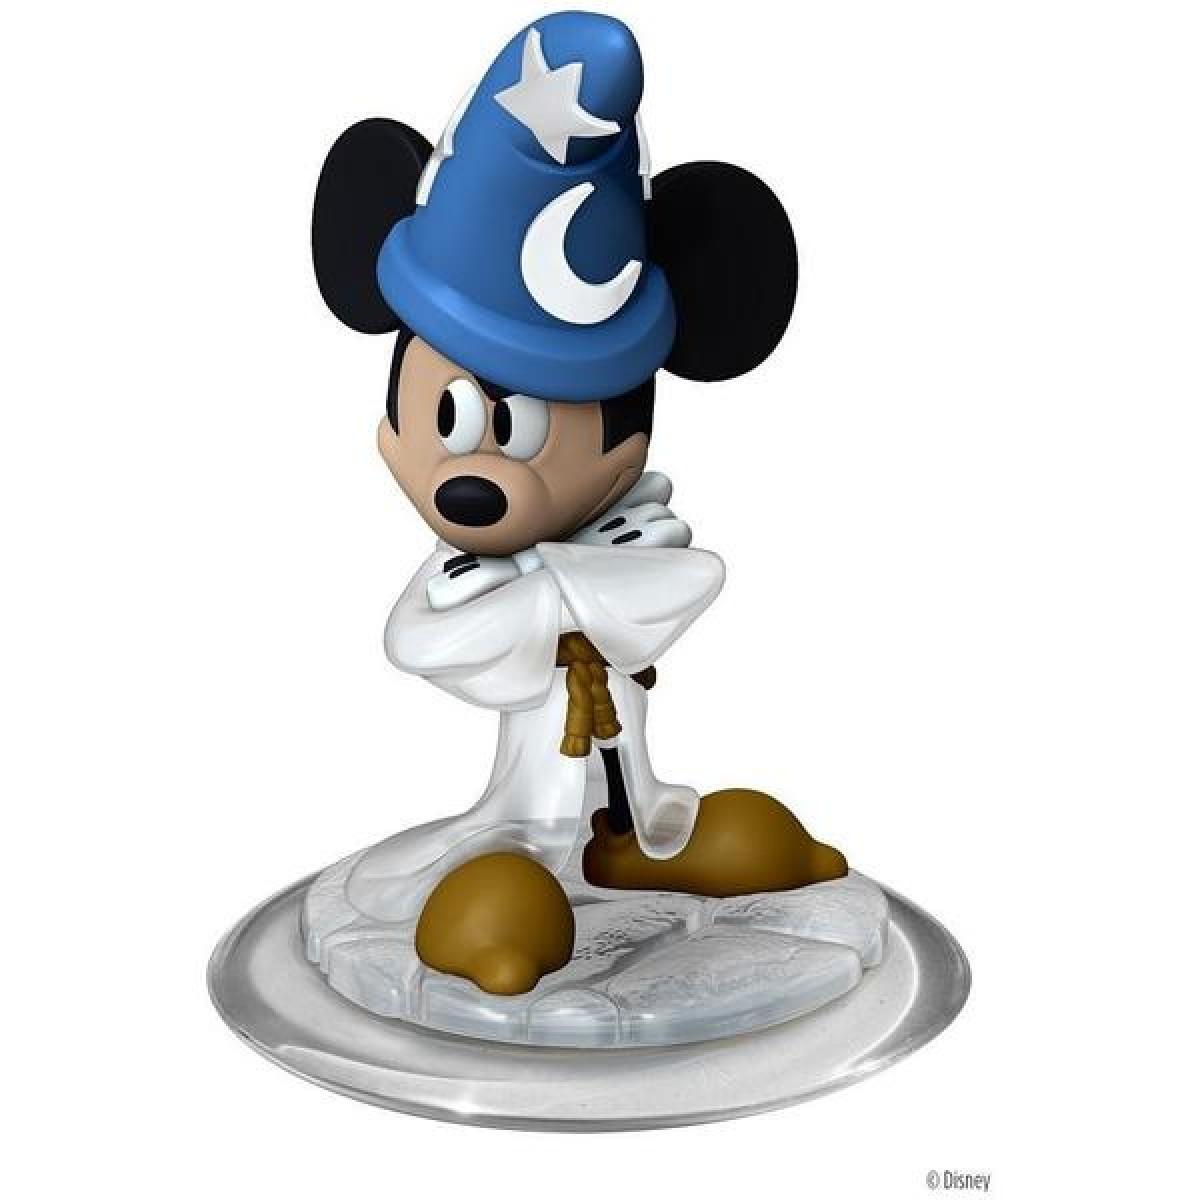 Disney Infinity 1.0  Crystal Sorcerer's Apprentice Mickey játékfigura